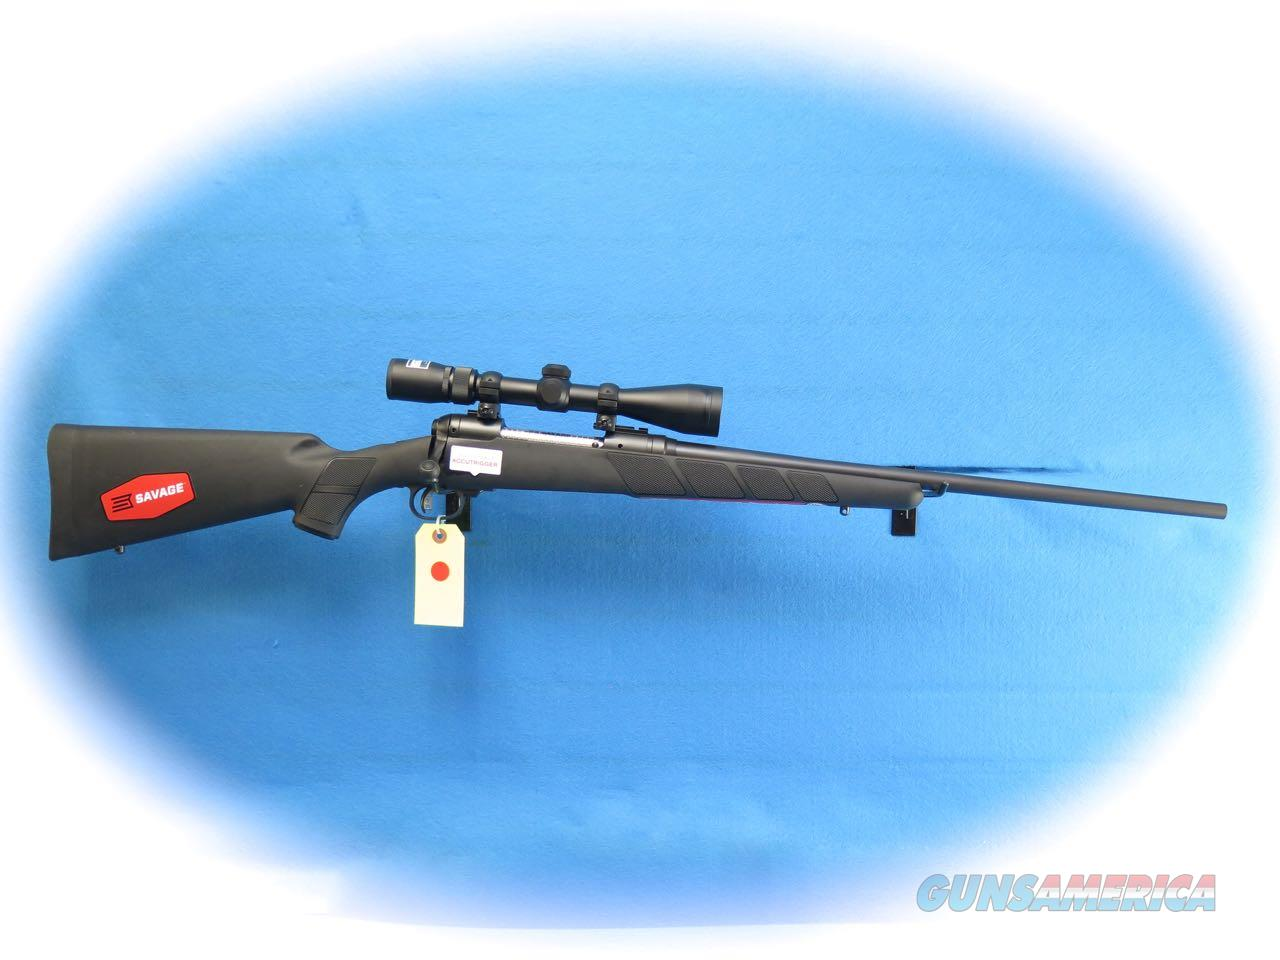 Savage 111 Trophy Hunter XP Bolt Action Rifle/Scope Pkg .30-06 Cal SKU 19690 **New**  Guns > Rifles > Savage Rifles > 11/111